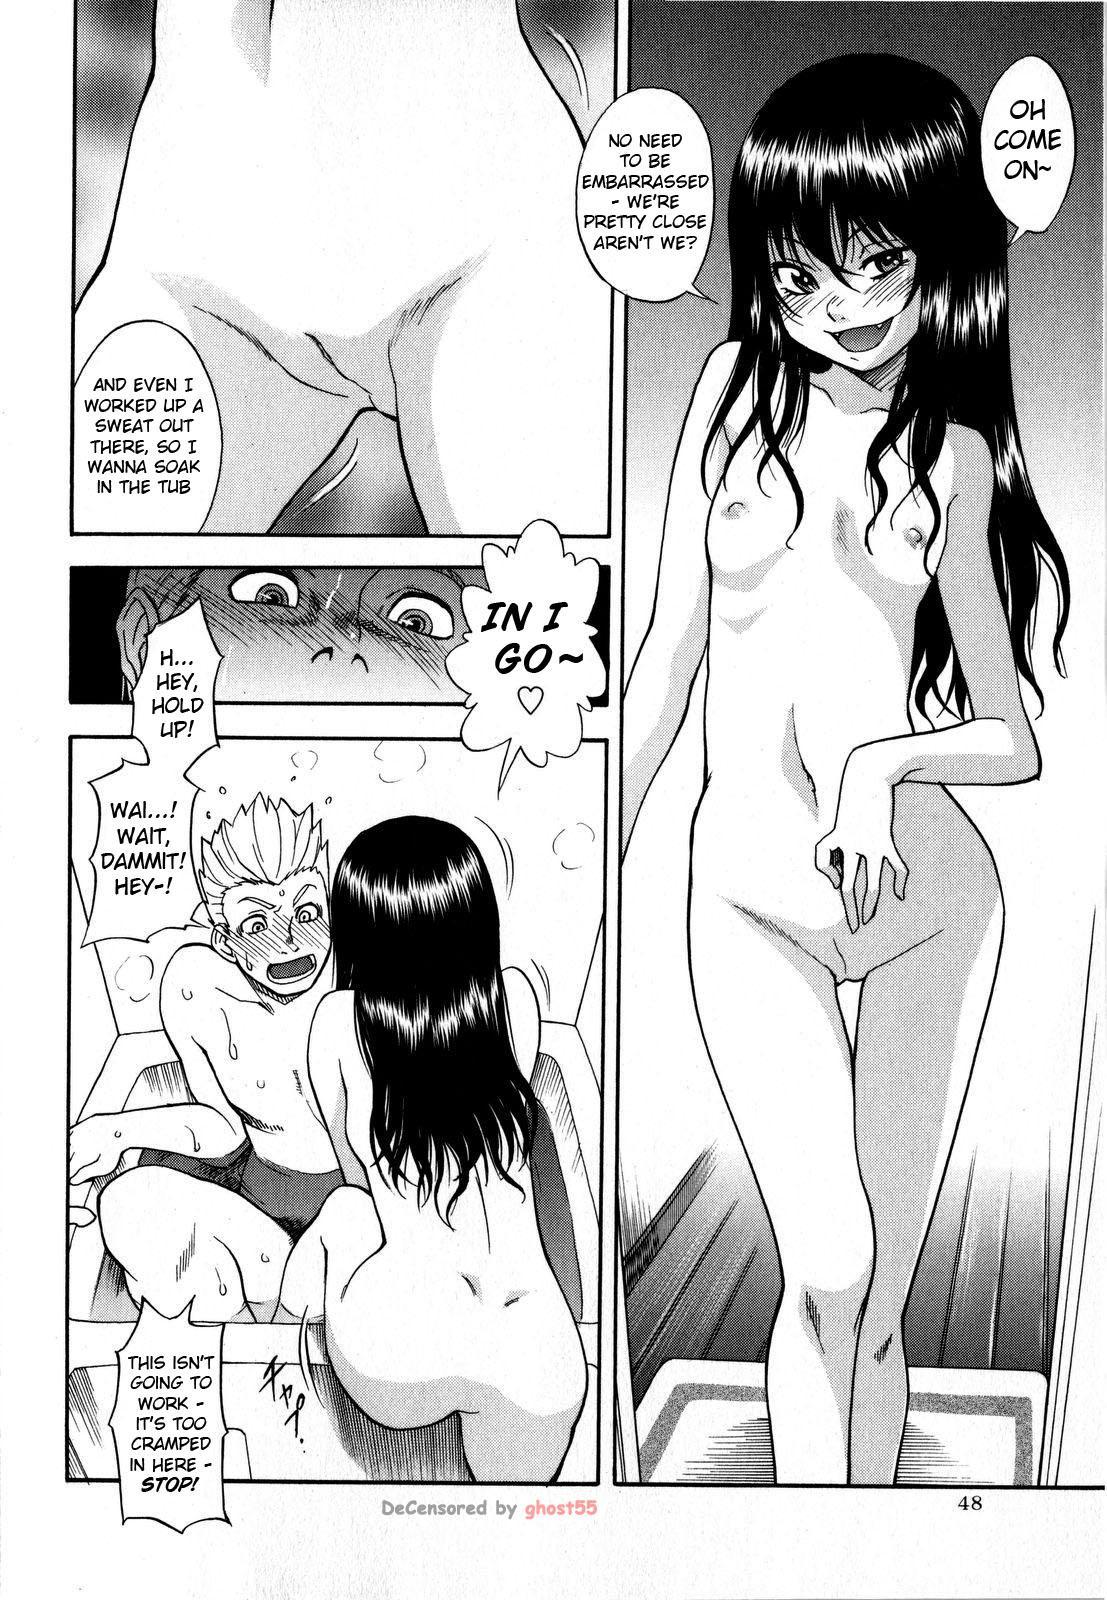 [Shiden Akira] Masegaki Temptation (Cute + Sexy = Little Devil!?) + Masegaki Satisfaction [English] [Decensored] 26